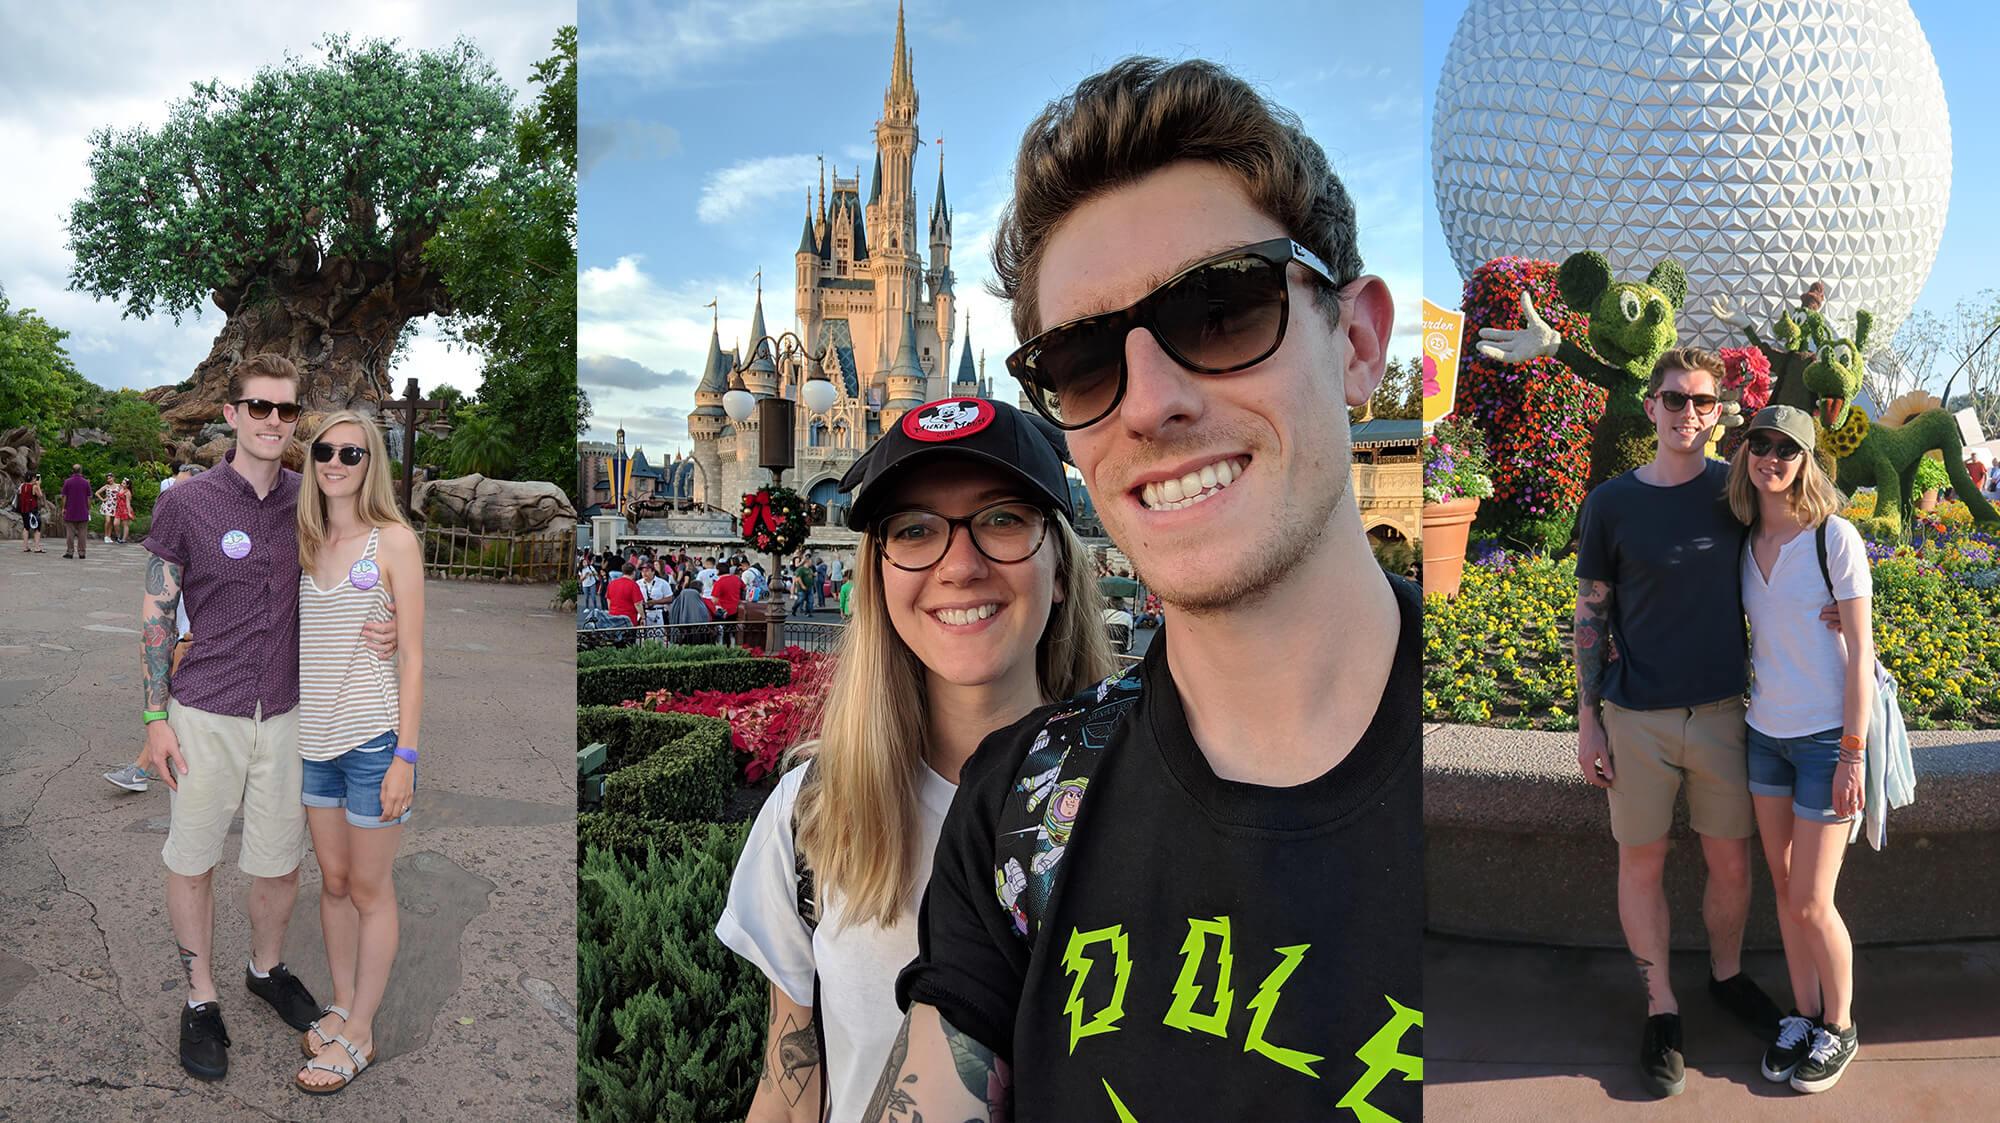 Yaz and Ash bring you the latest news at Disneyworld Orlando!